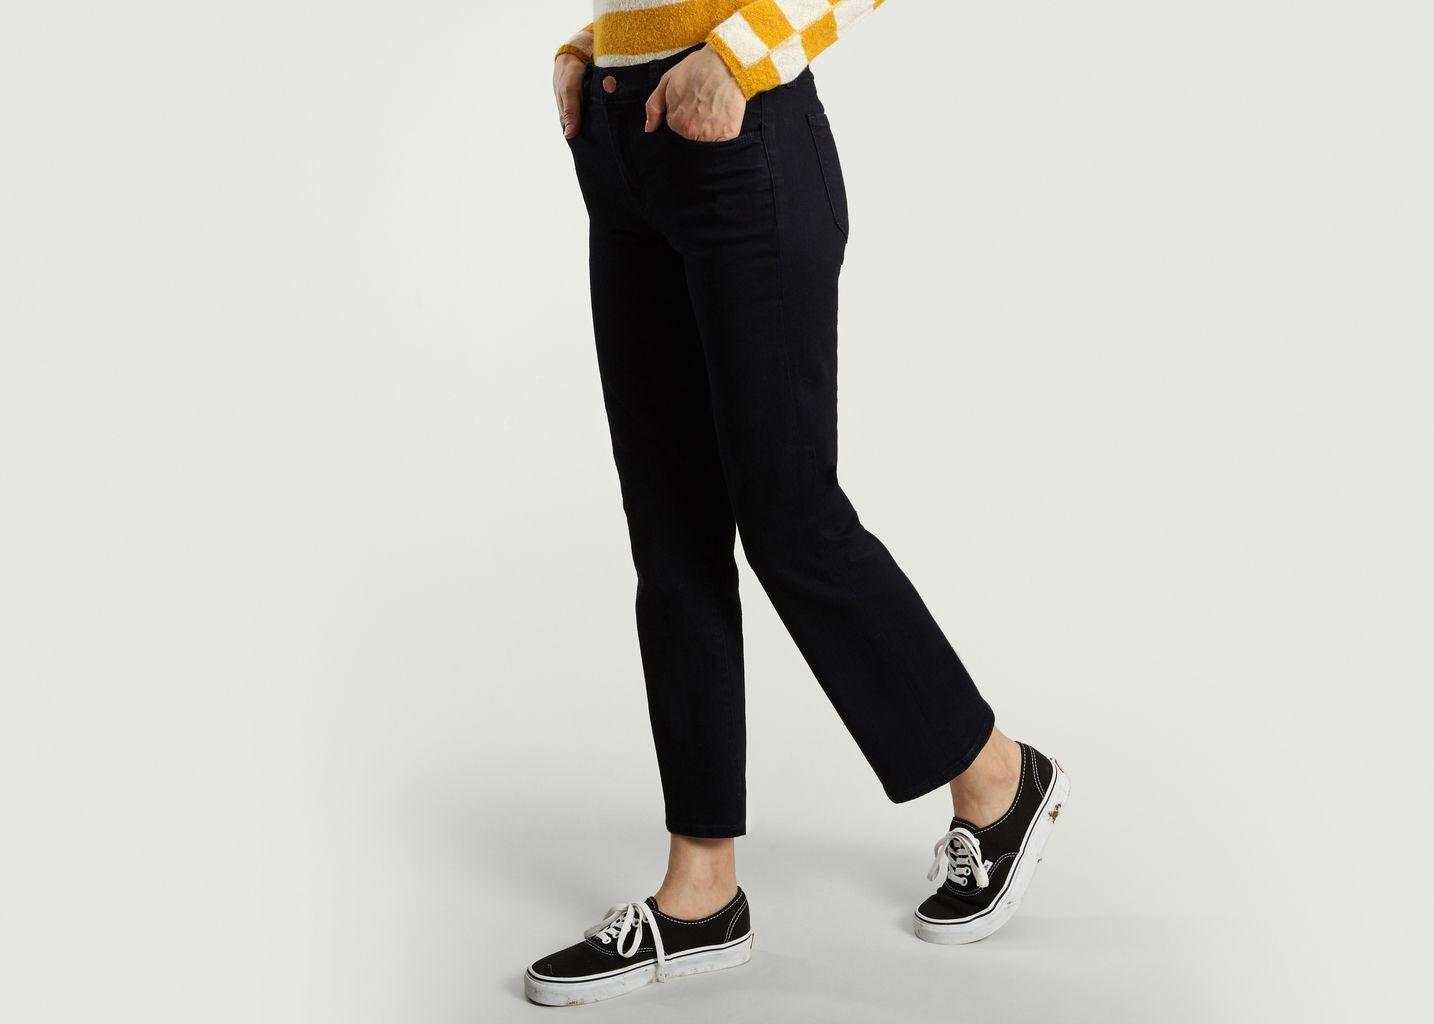 Jean Selena Mid Rise Crop Bootcut - J Brand